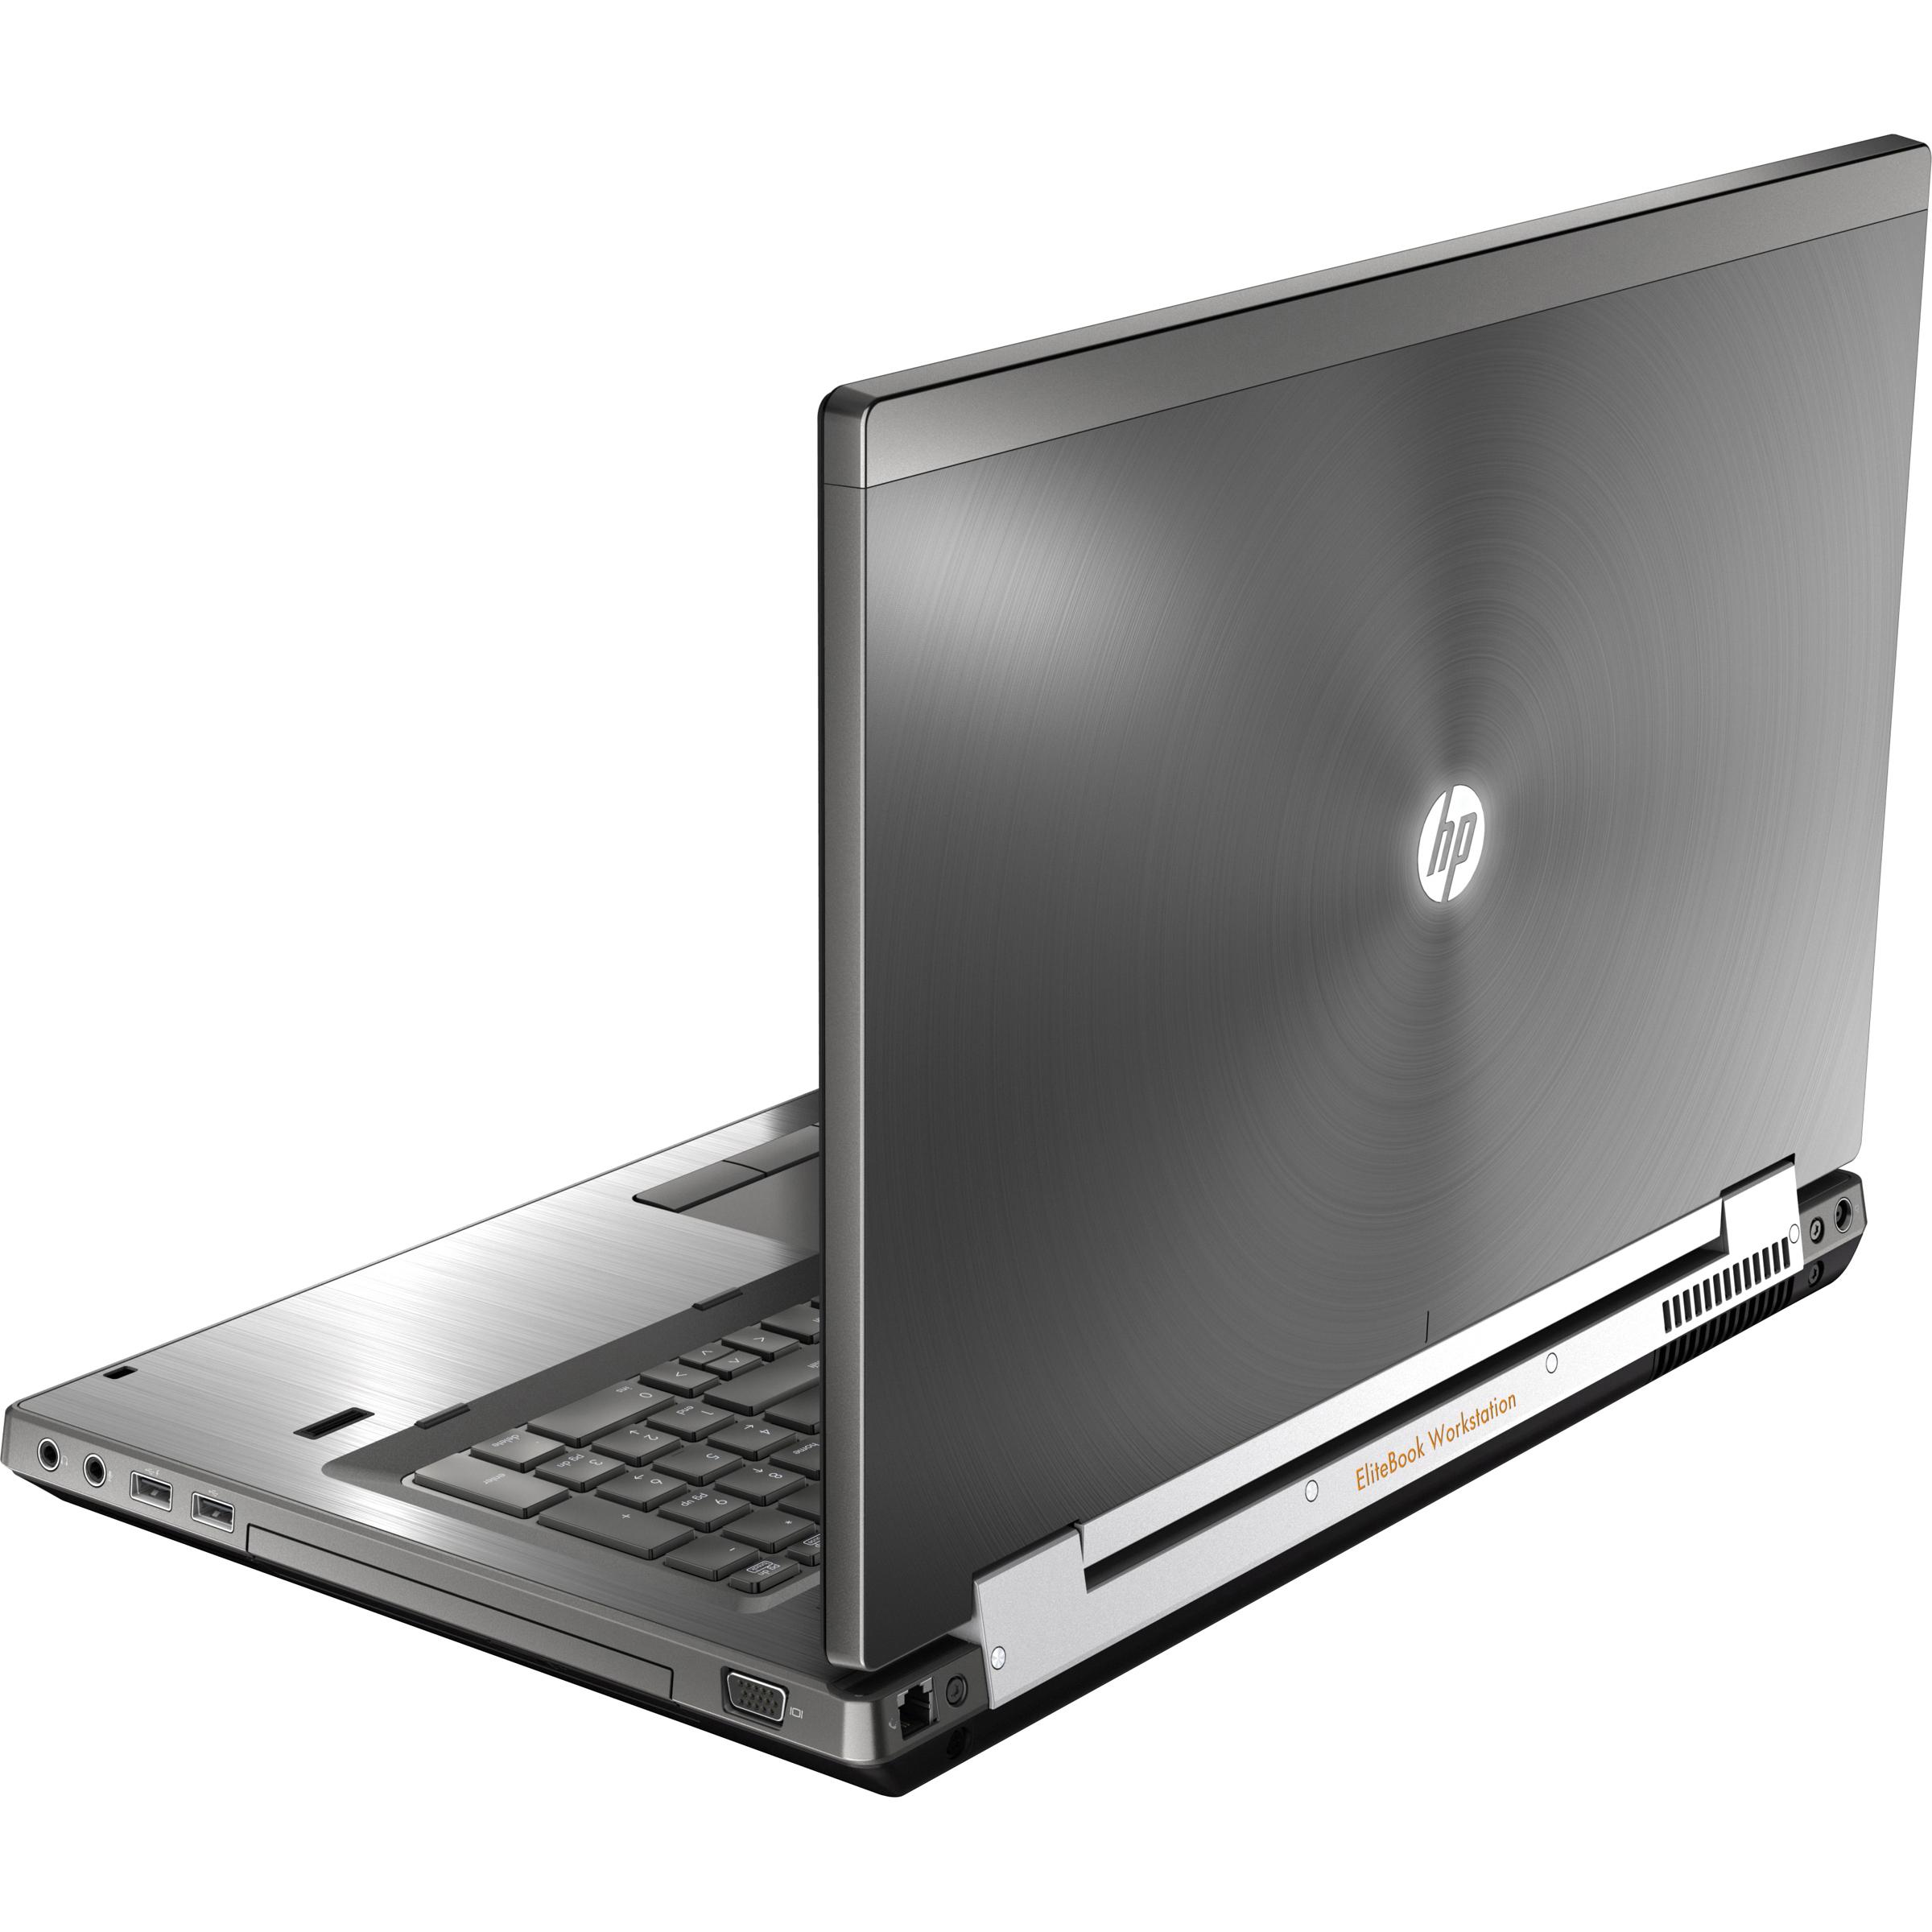 HP EliteBook 8770w 43.9 cm 17.3inch LED Notebook - Intel Core i7 i7-3840QM 2.80 GHz - Gunmetal